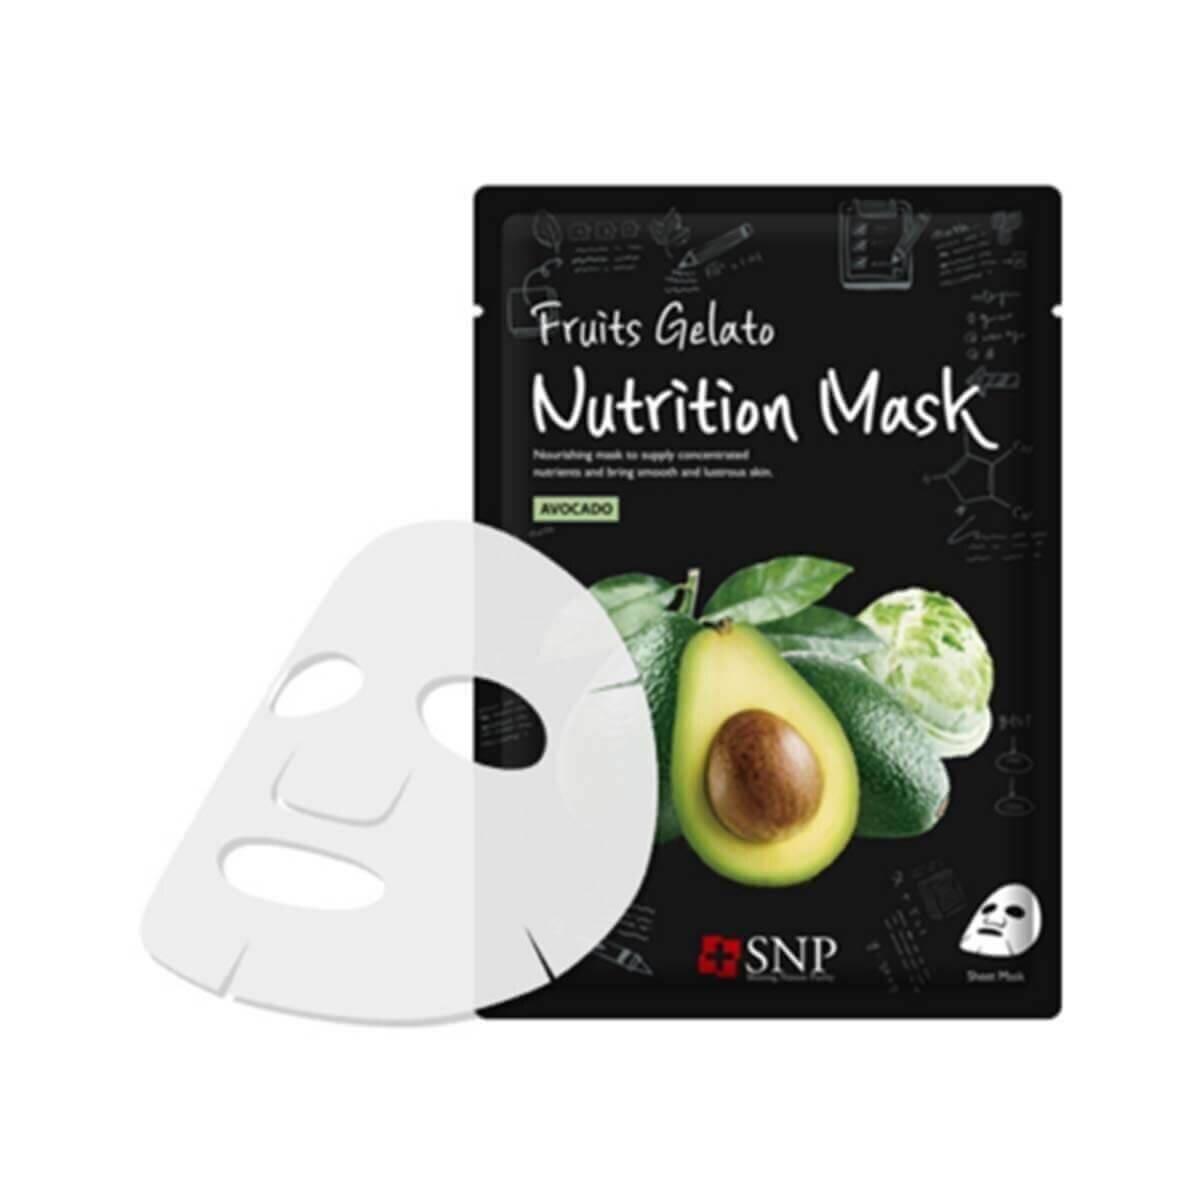 Fruits Gelato Nutrition Maske 33 ml